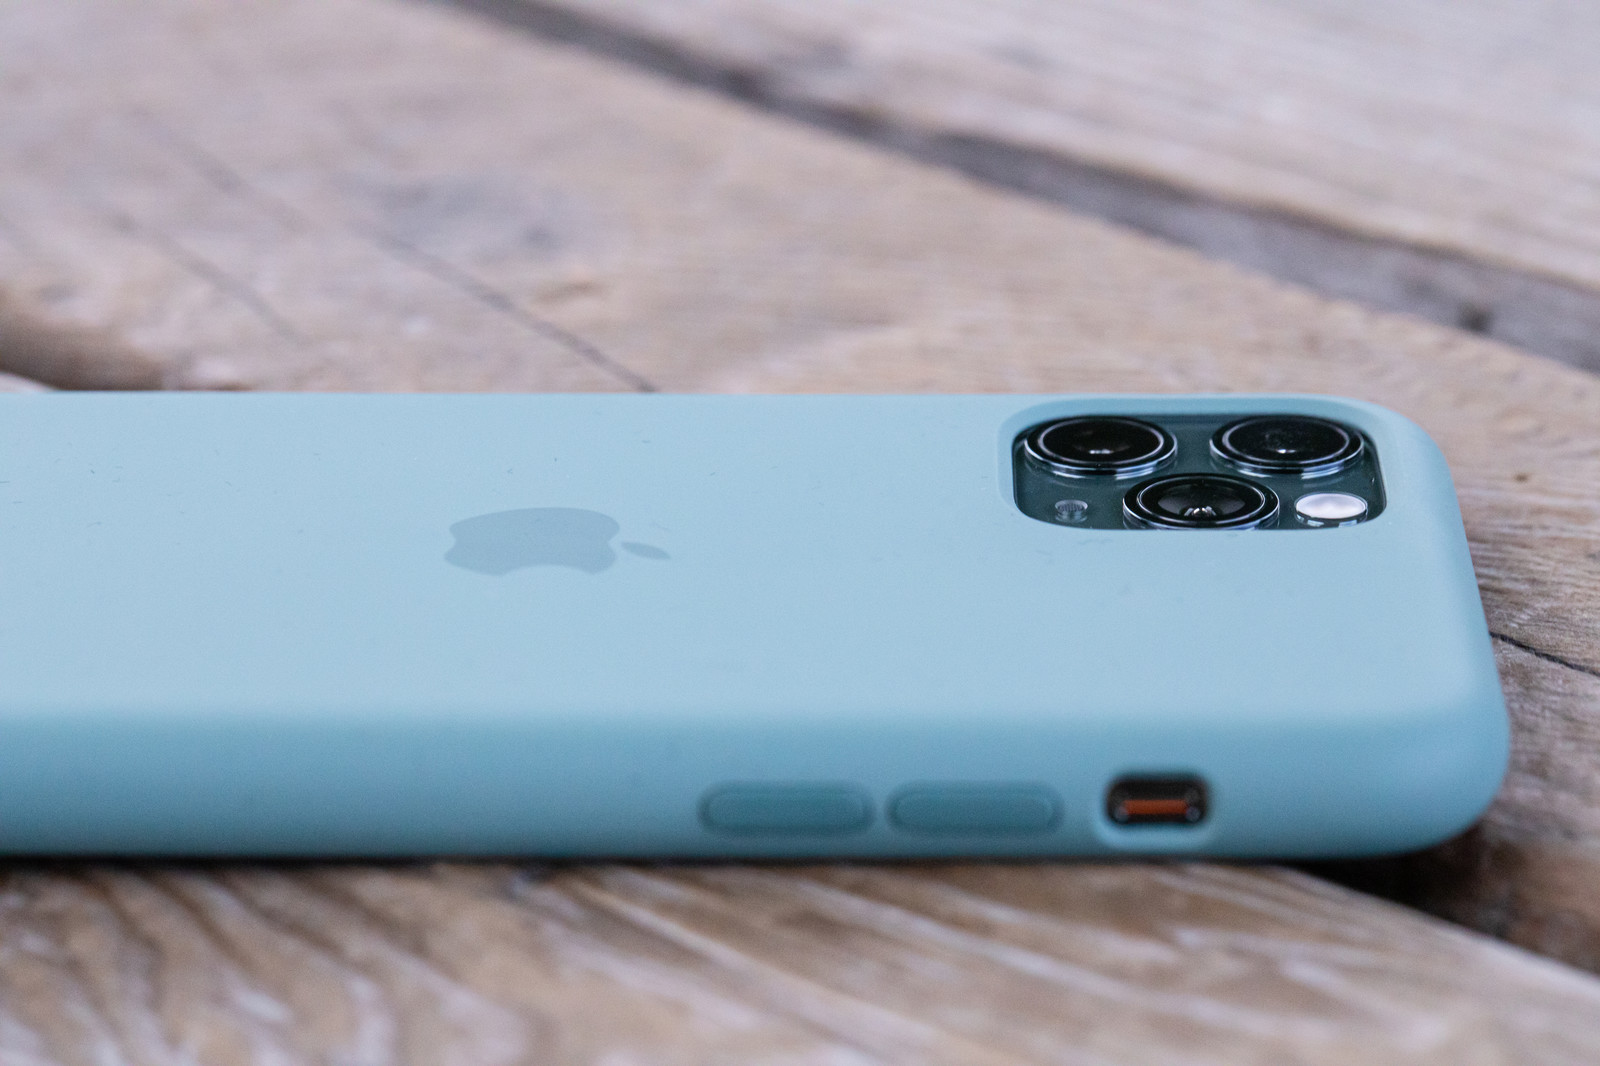 「iPhone 11 Pro の純正シリコンケースを装着」の写真